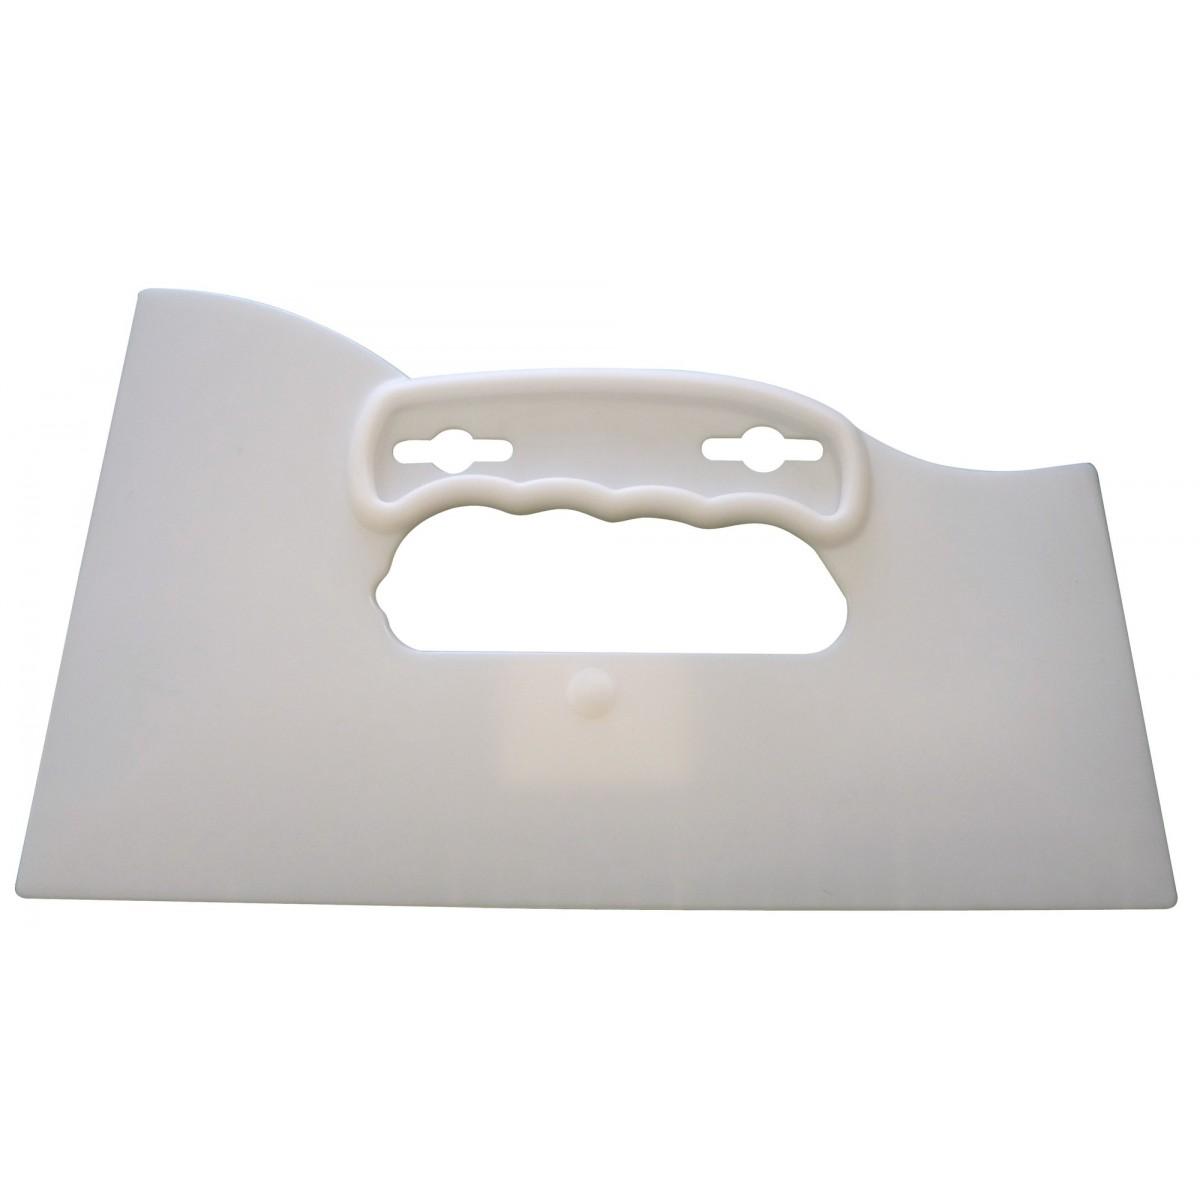 spatule maroufler outibat de spatule maroufler 1080094 mon magasin g n ral. Black Bedroom Furniture Sets. Home Design Ideas